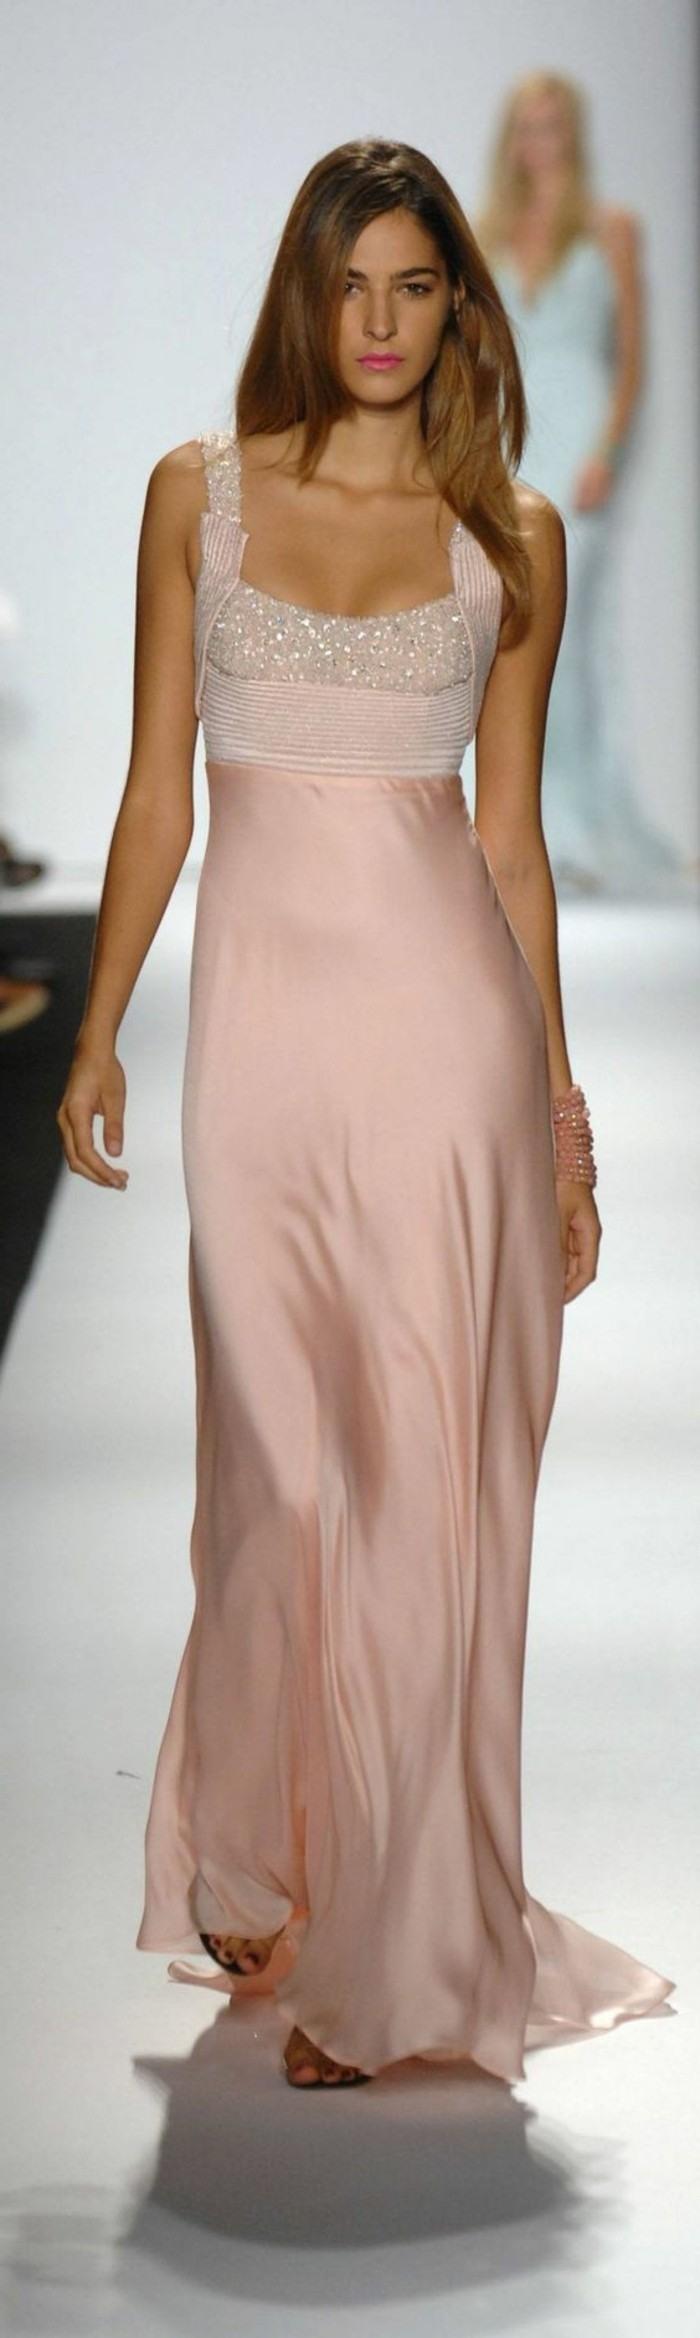 20 Fantastisch Elegante Moderne Kleider Bester Preis10 Schön Elegante Moderne Kleider Spezialgebiet